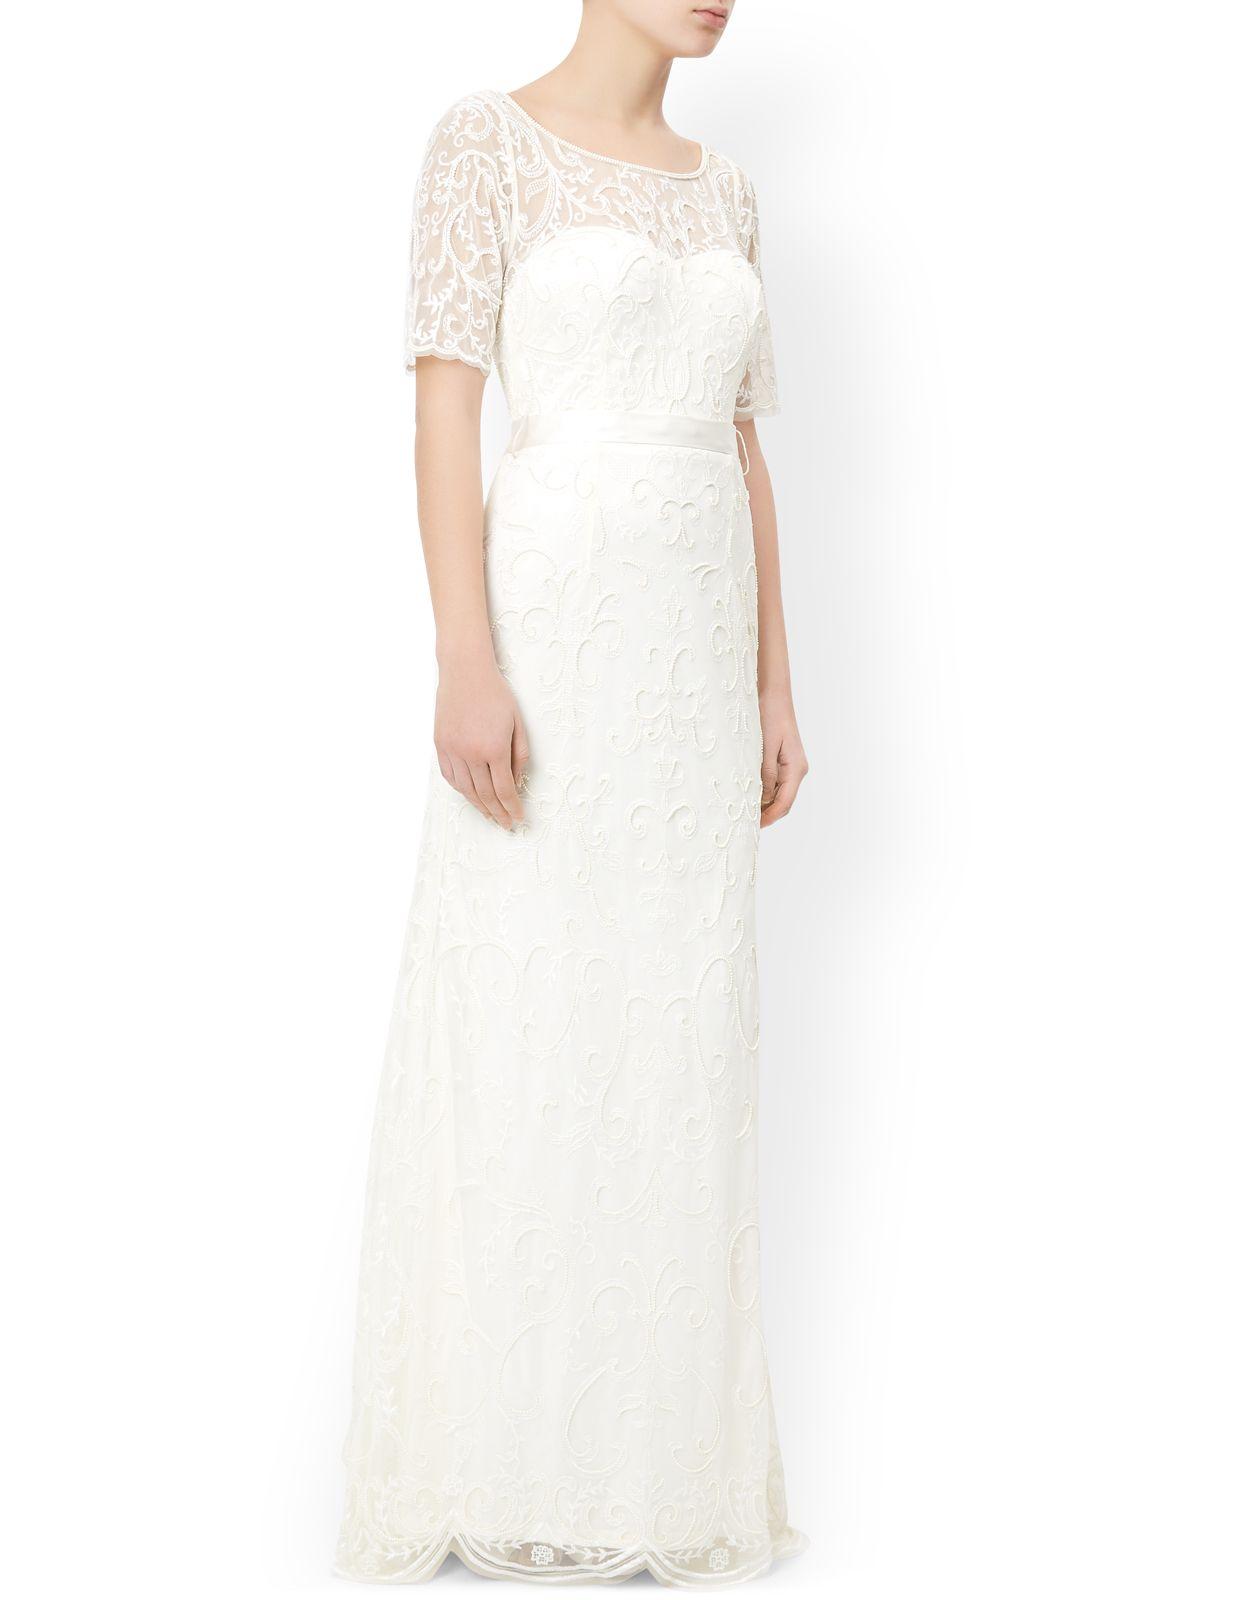 Farah Bridal Dress Http Www Weddingheart Co Uk Monsoon Wedding Dresses Html High Street Wedding Dresses Dresses Bridal Dresses Lace